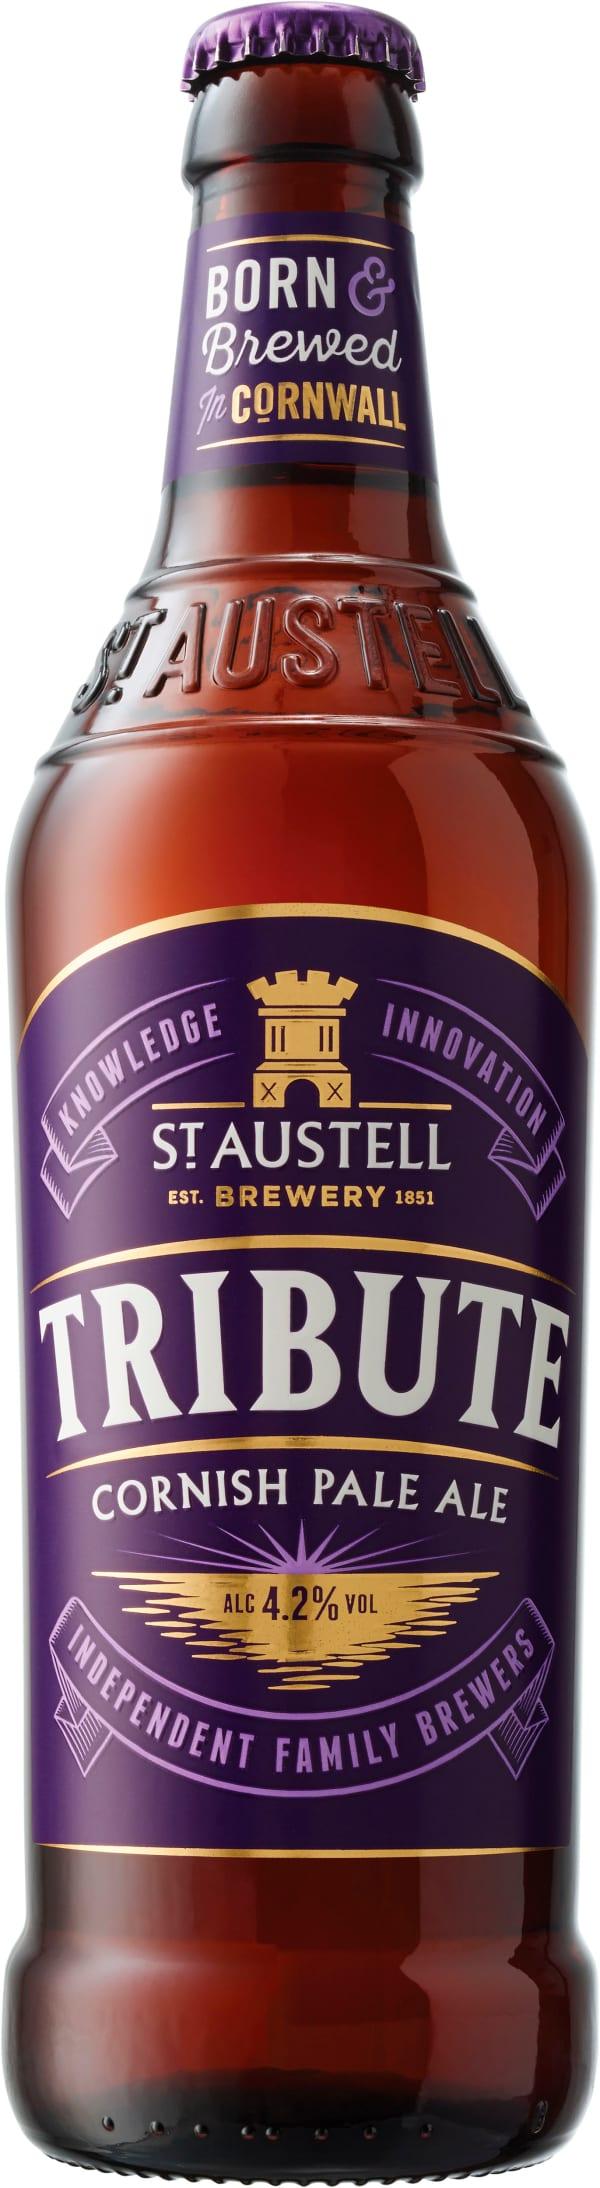 St. Austell Tribute